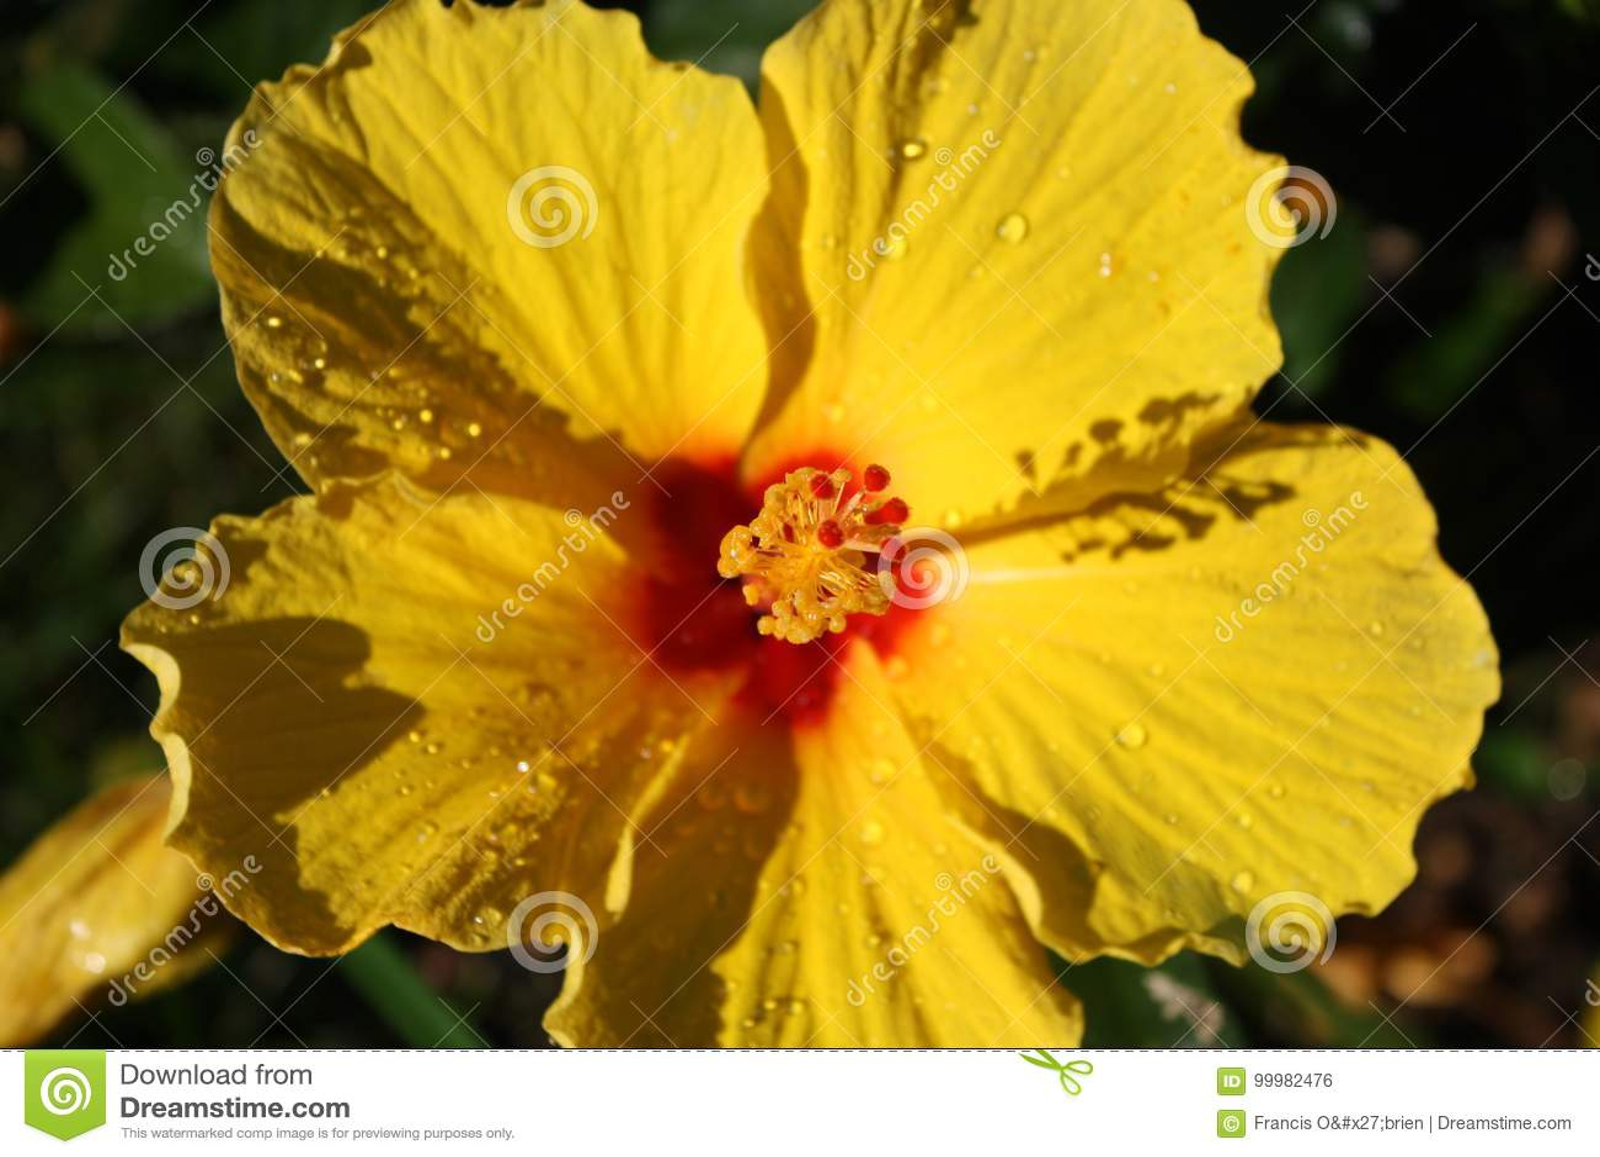 Yellow Hibiscus Flower 6 Stock Photo Image Of Them White 99982476